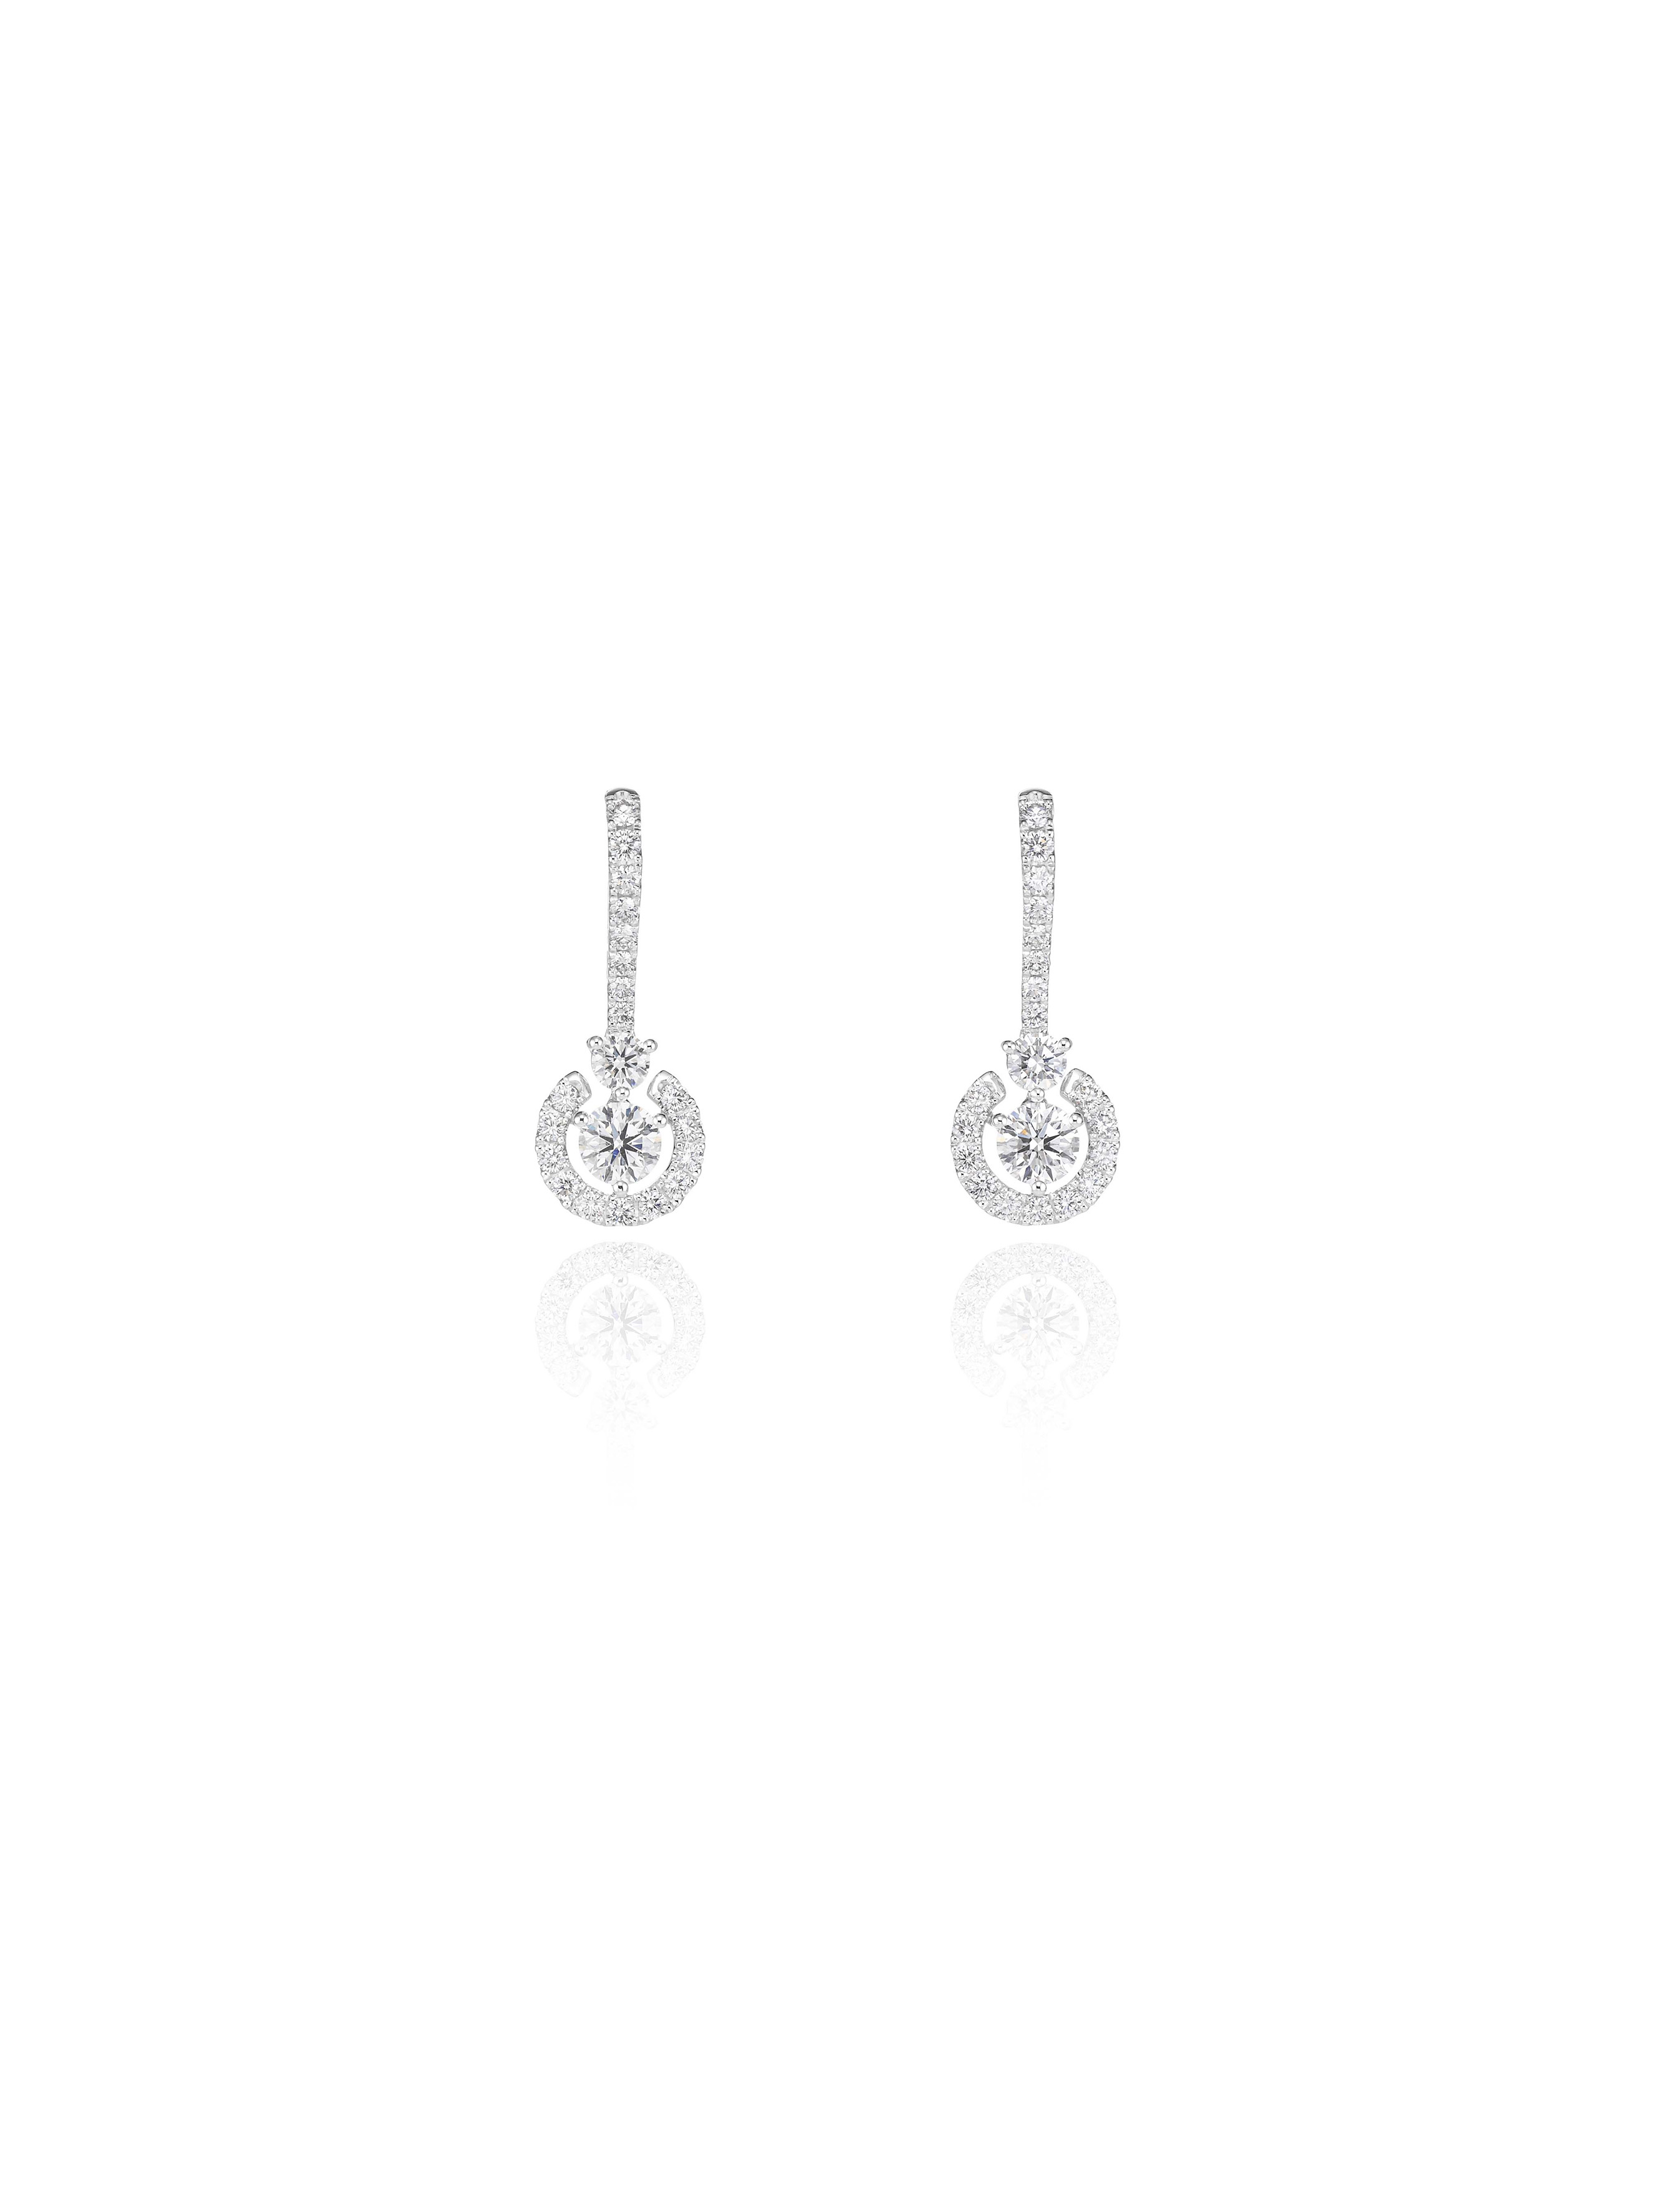 Green Carpet earrings